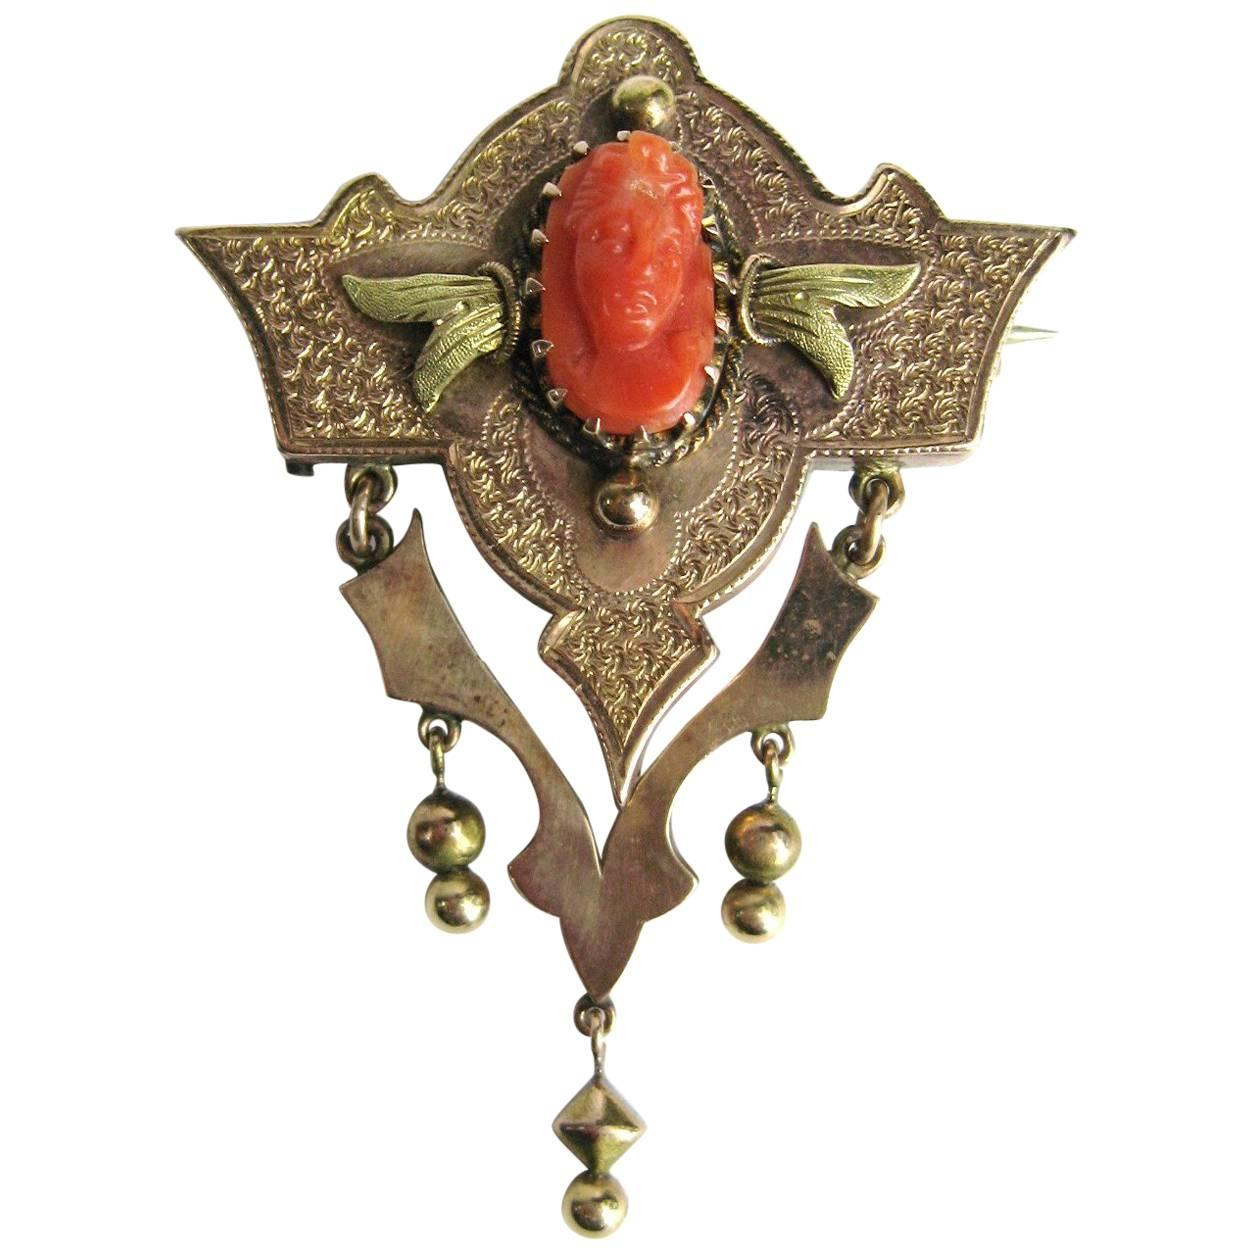 14 Karat Gold Coral Cameo Brooch Pin Pendant Victorian